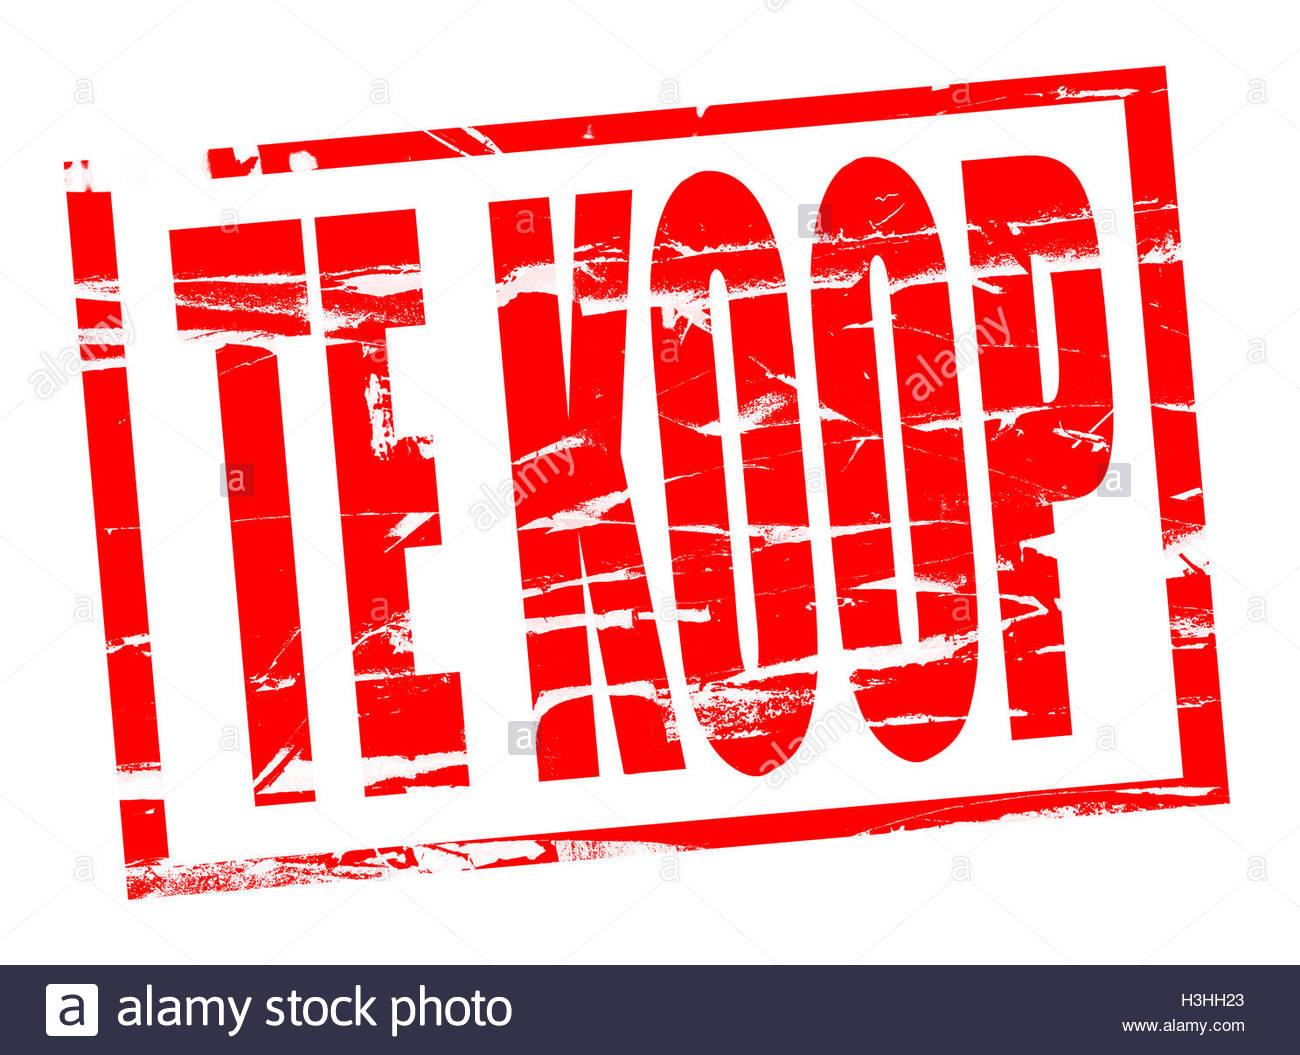 Rode stempel effect te koop For sale in Dutch - Stock Image